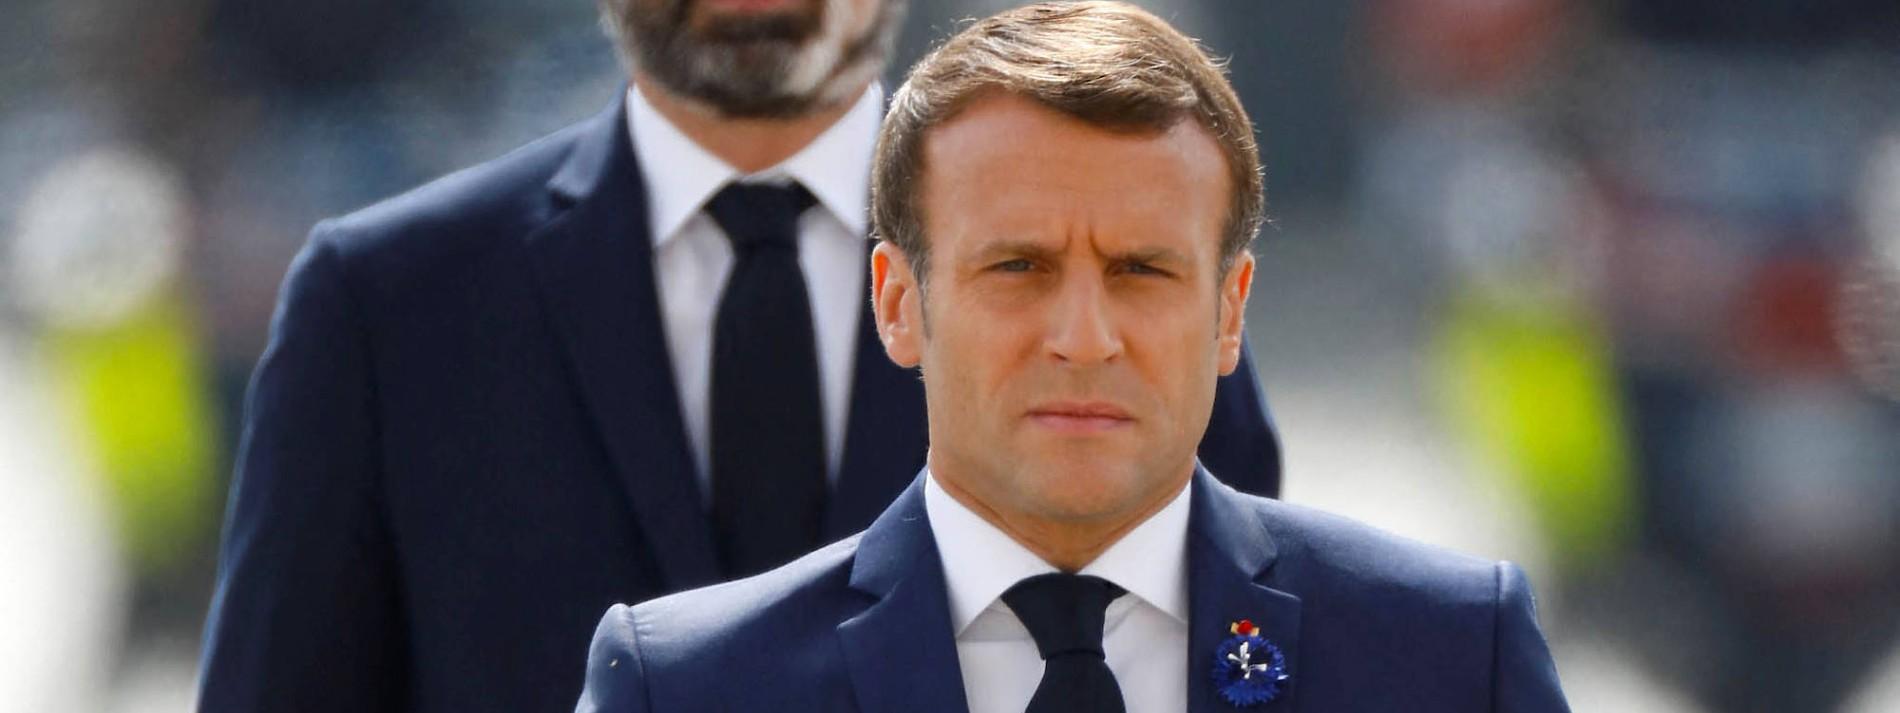 Michel Houellebecq: News der FAZ zum Schriftsteller